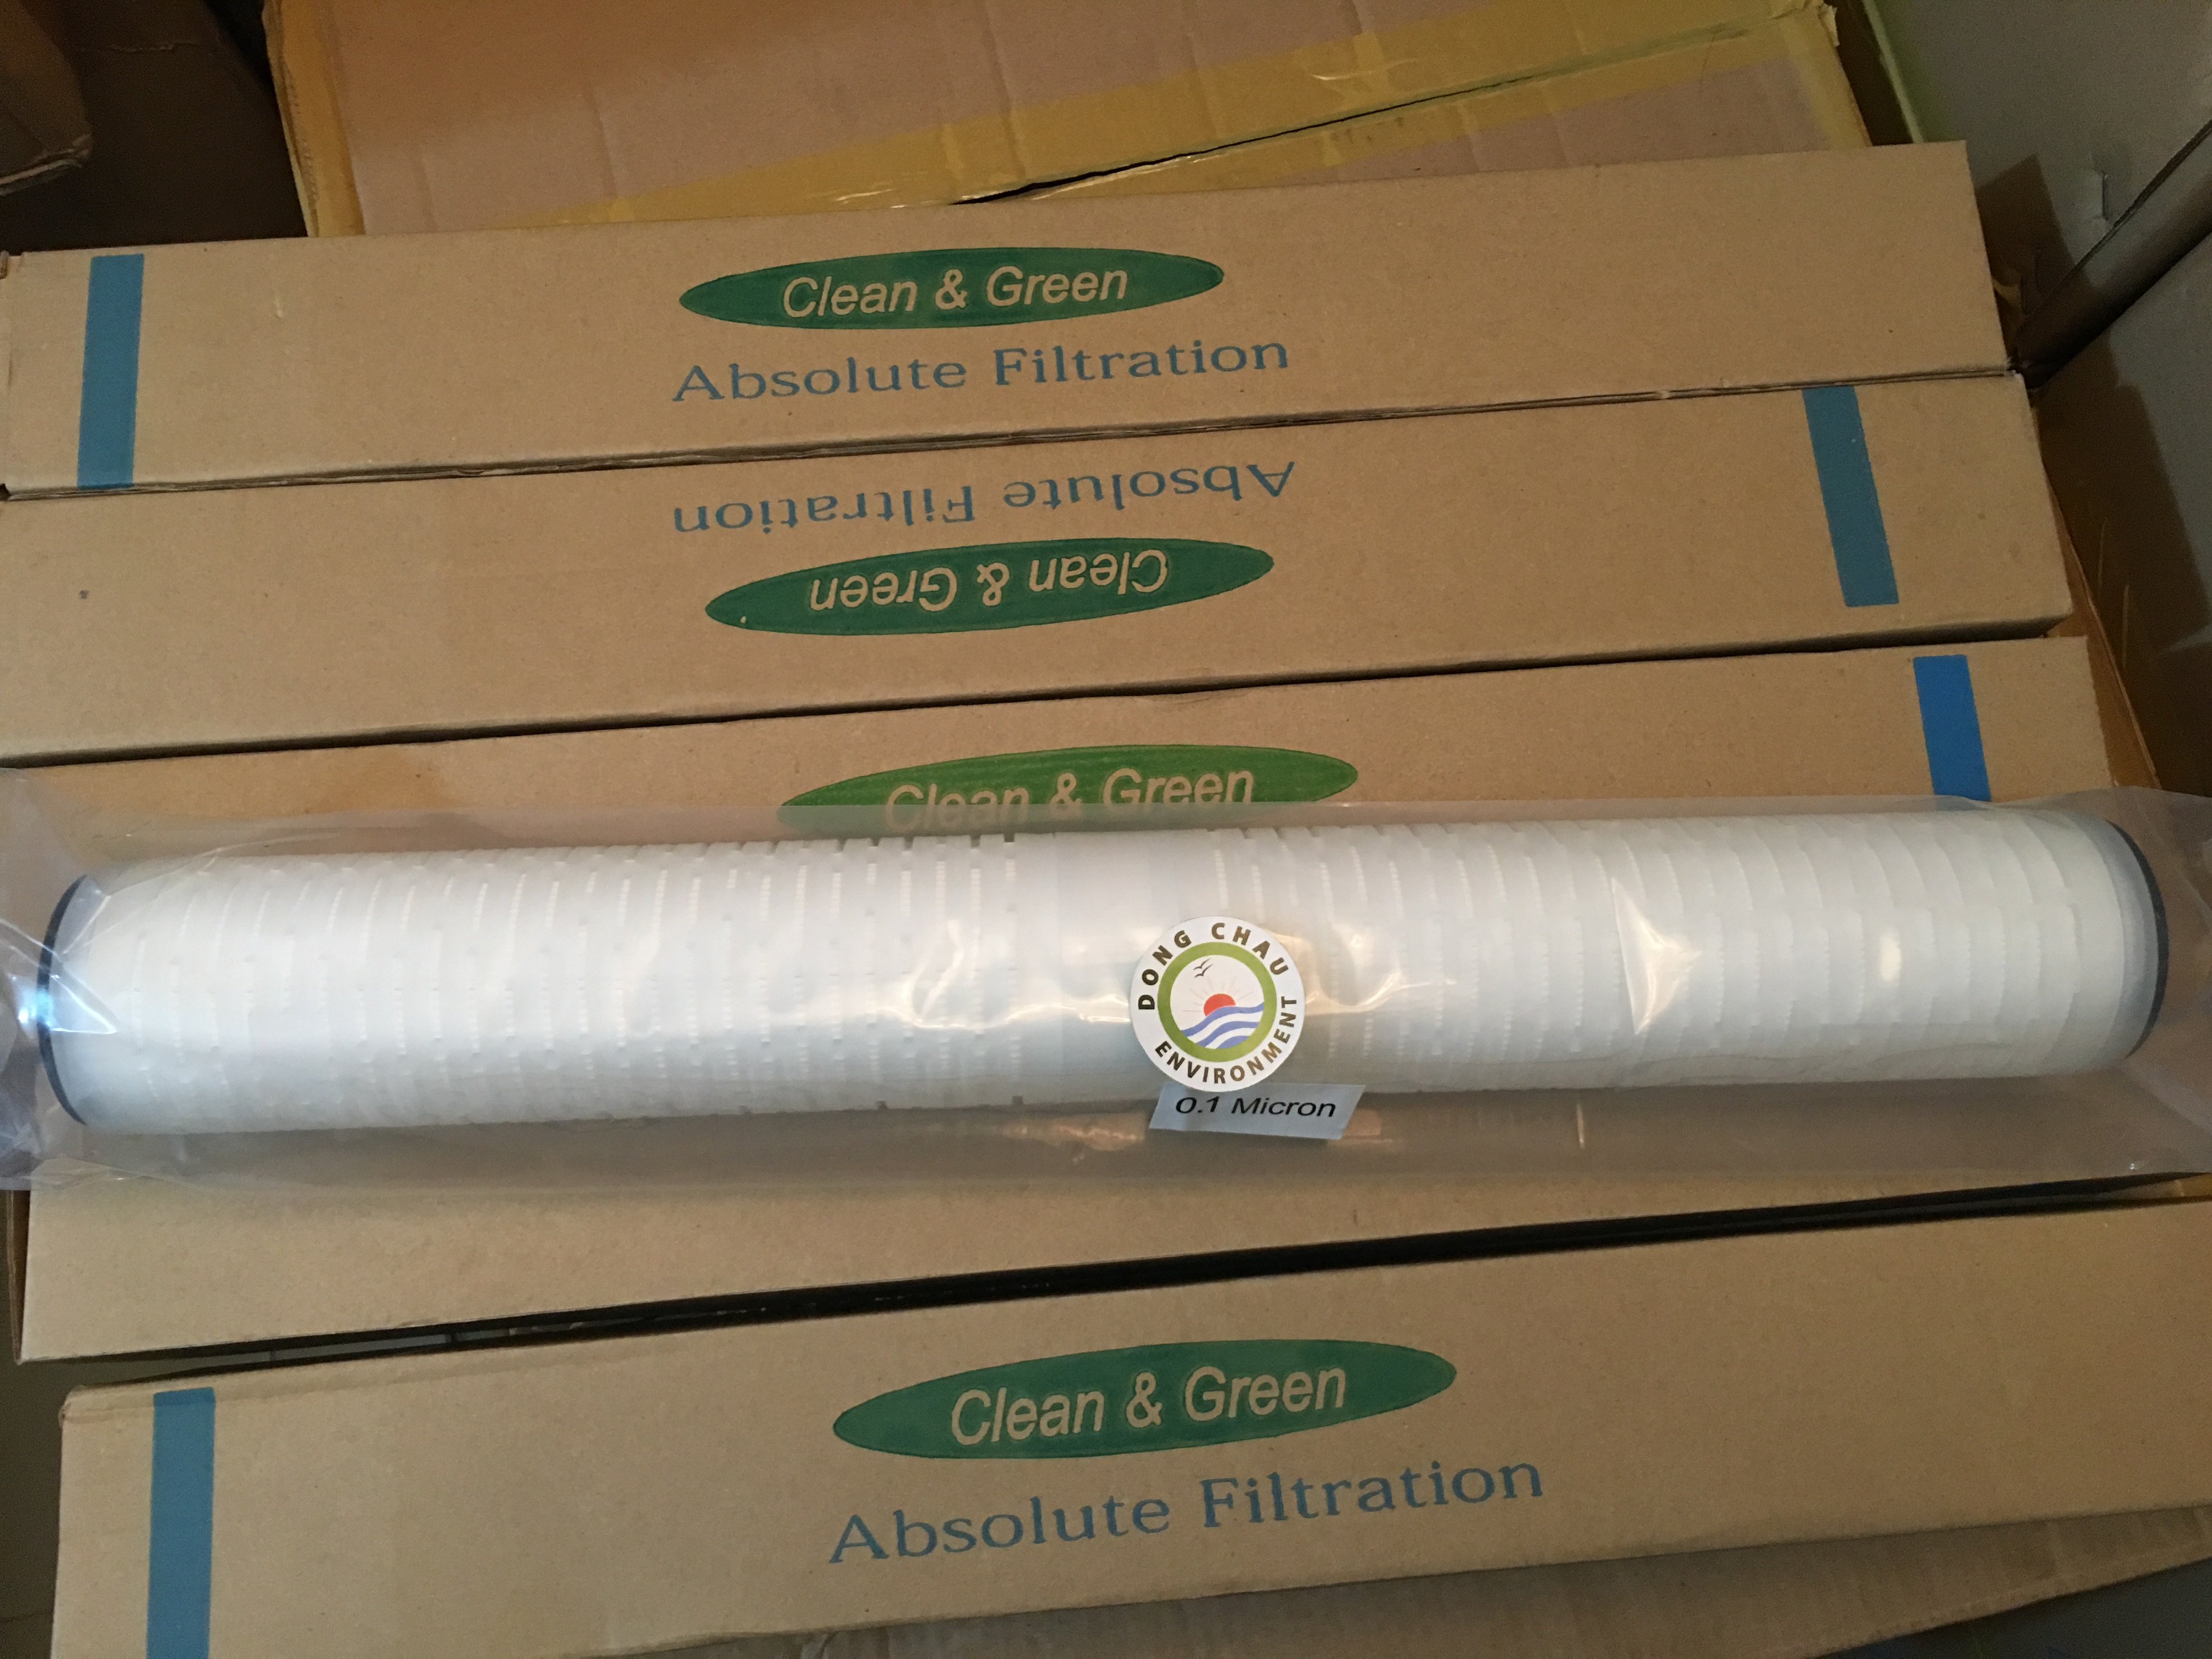 Lõi lọc giấy xếp 0.1 micron 20 inch DOE Clean Green